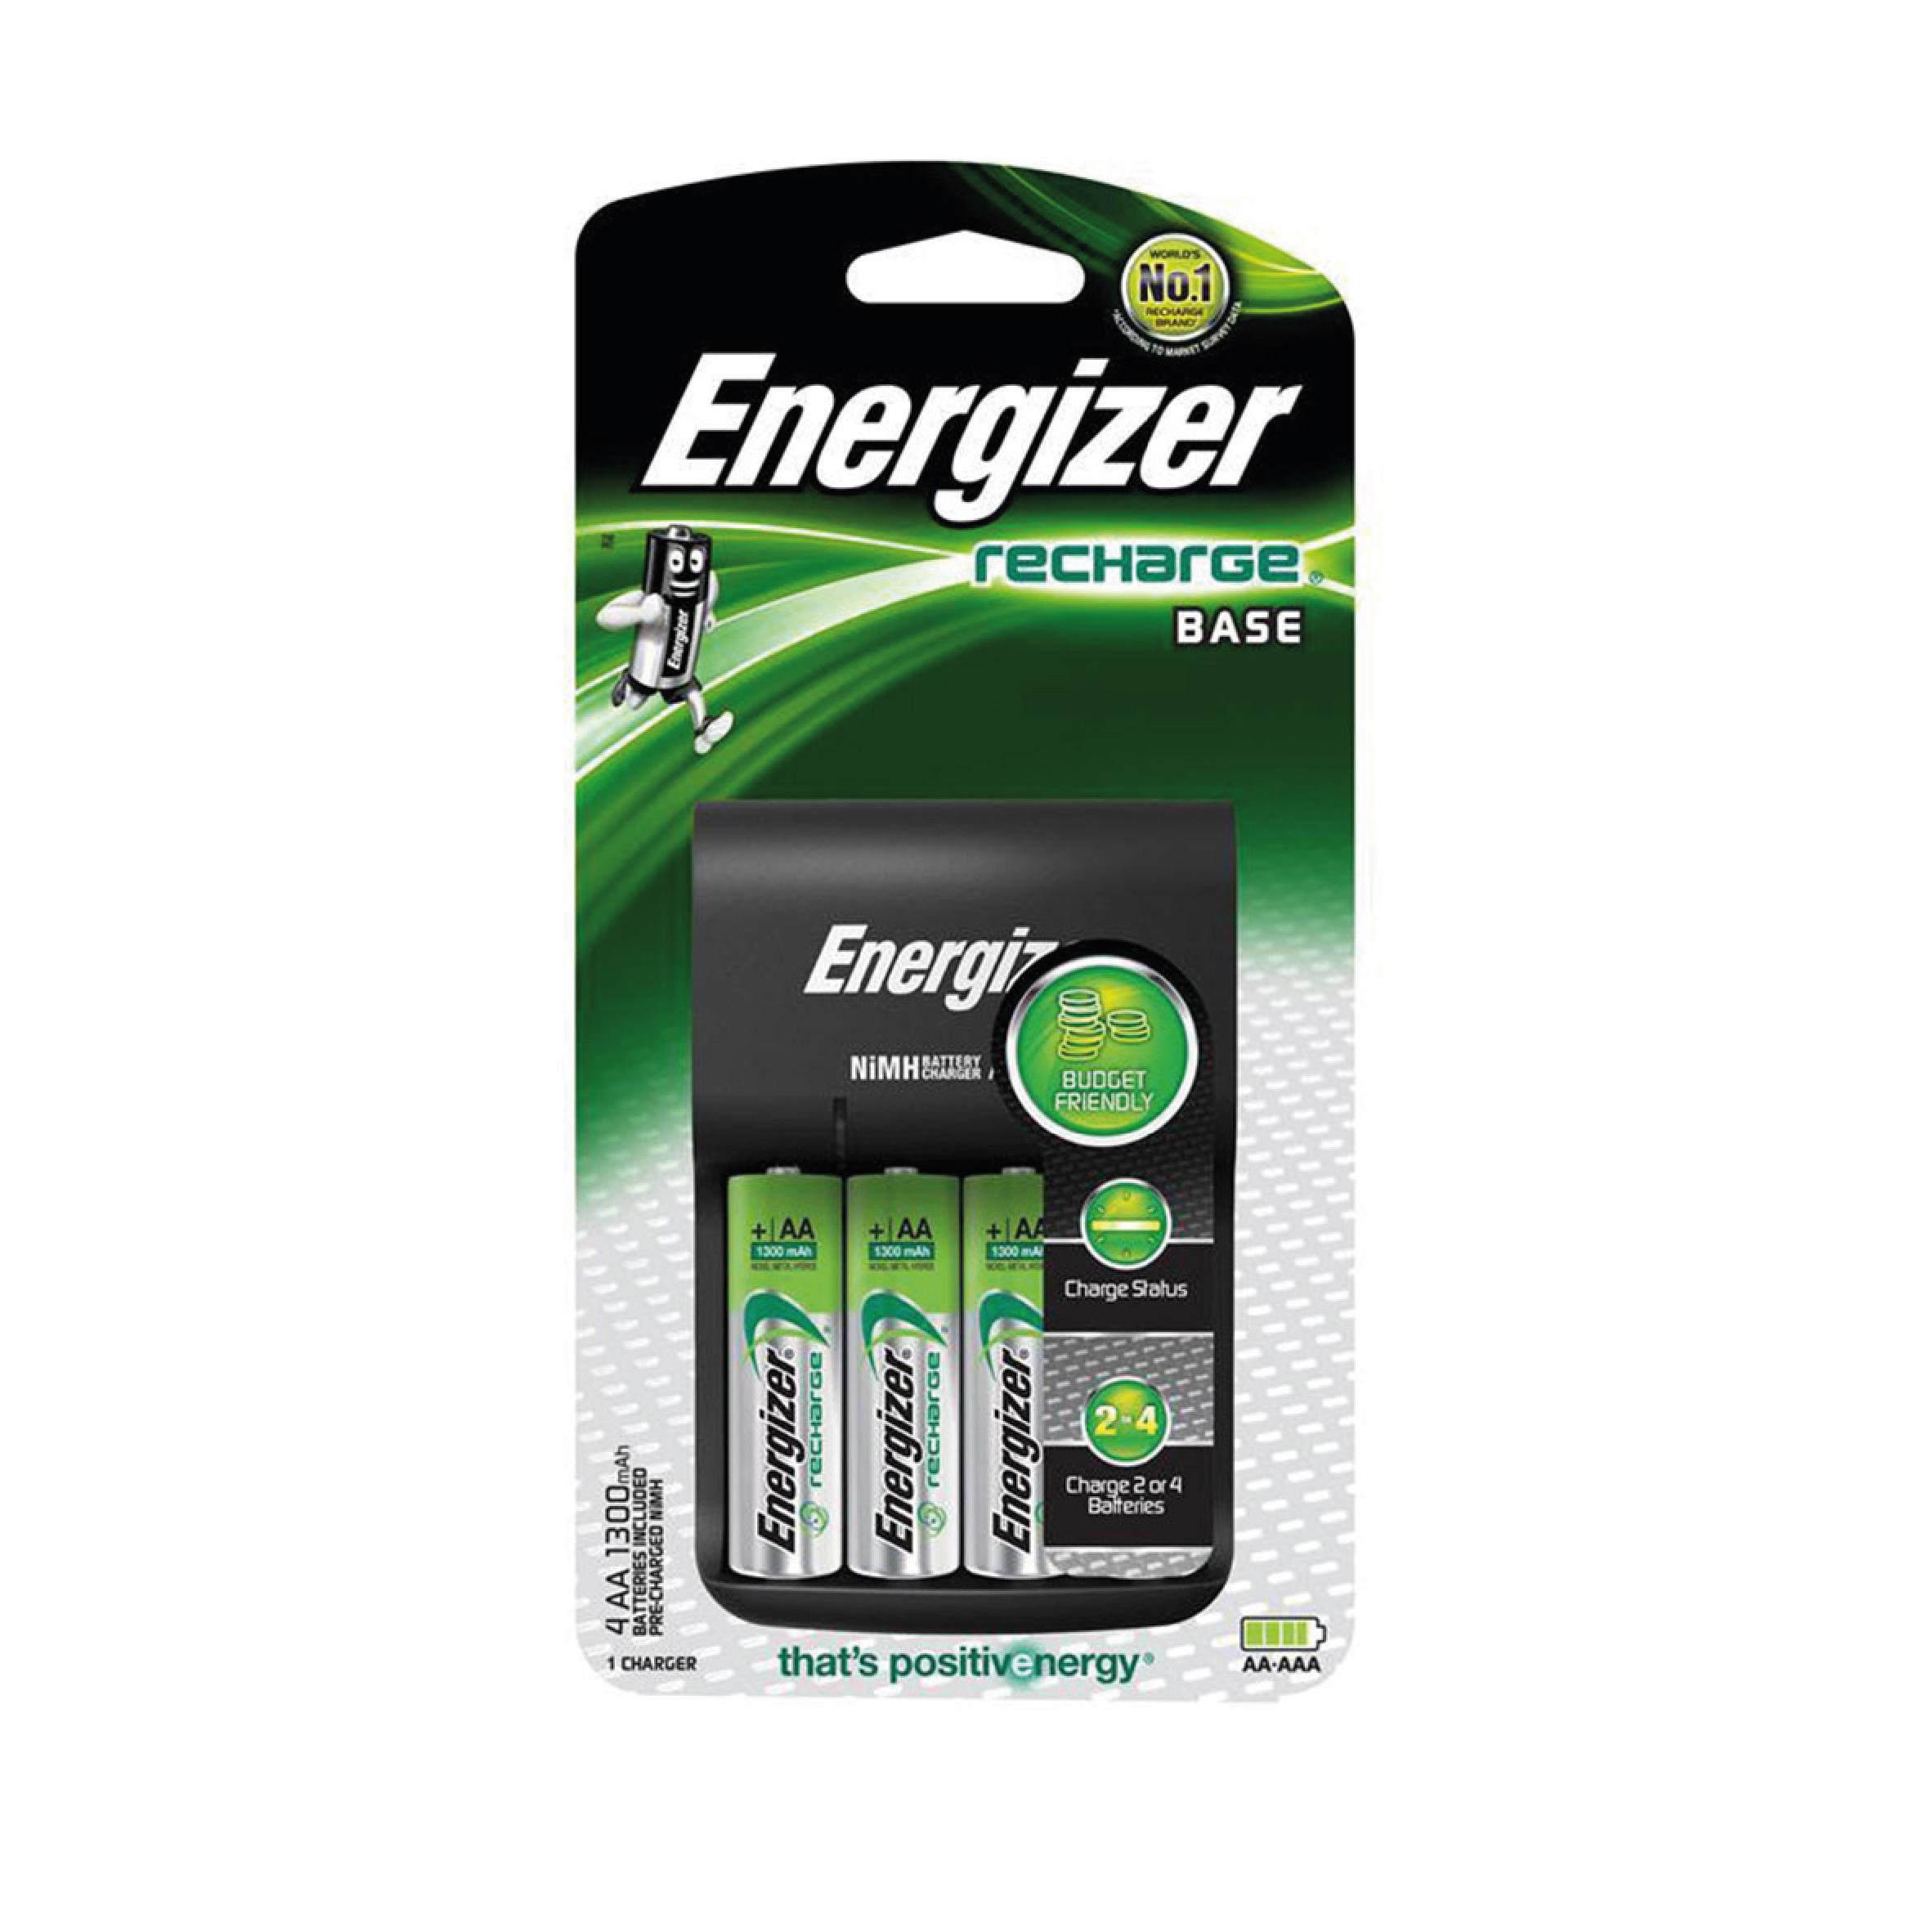 Energizer Base Battery Charger 1300mAh CHVC4